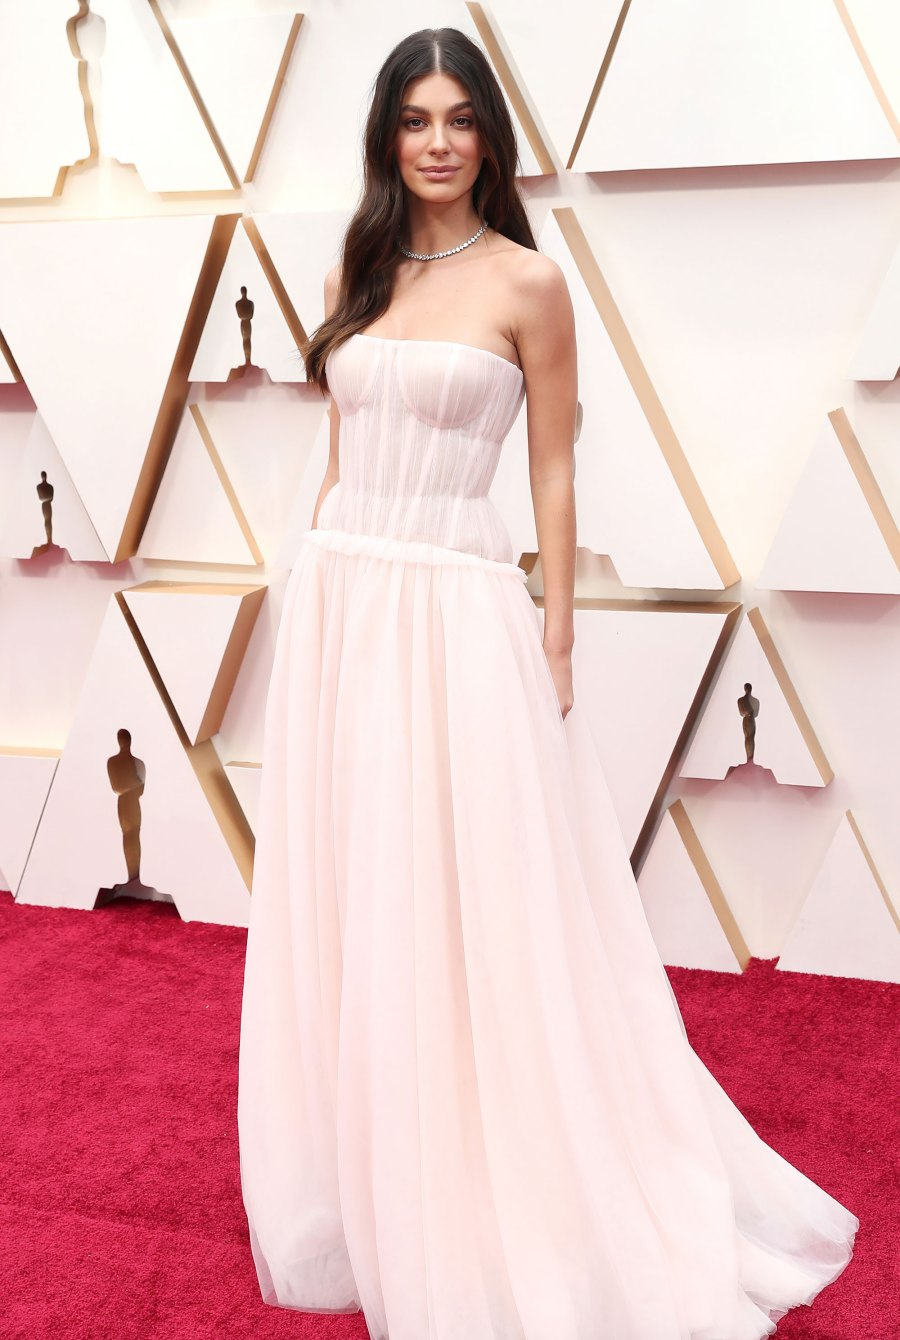 Oscars 2020 Arrivals - Camila Morrone